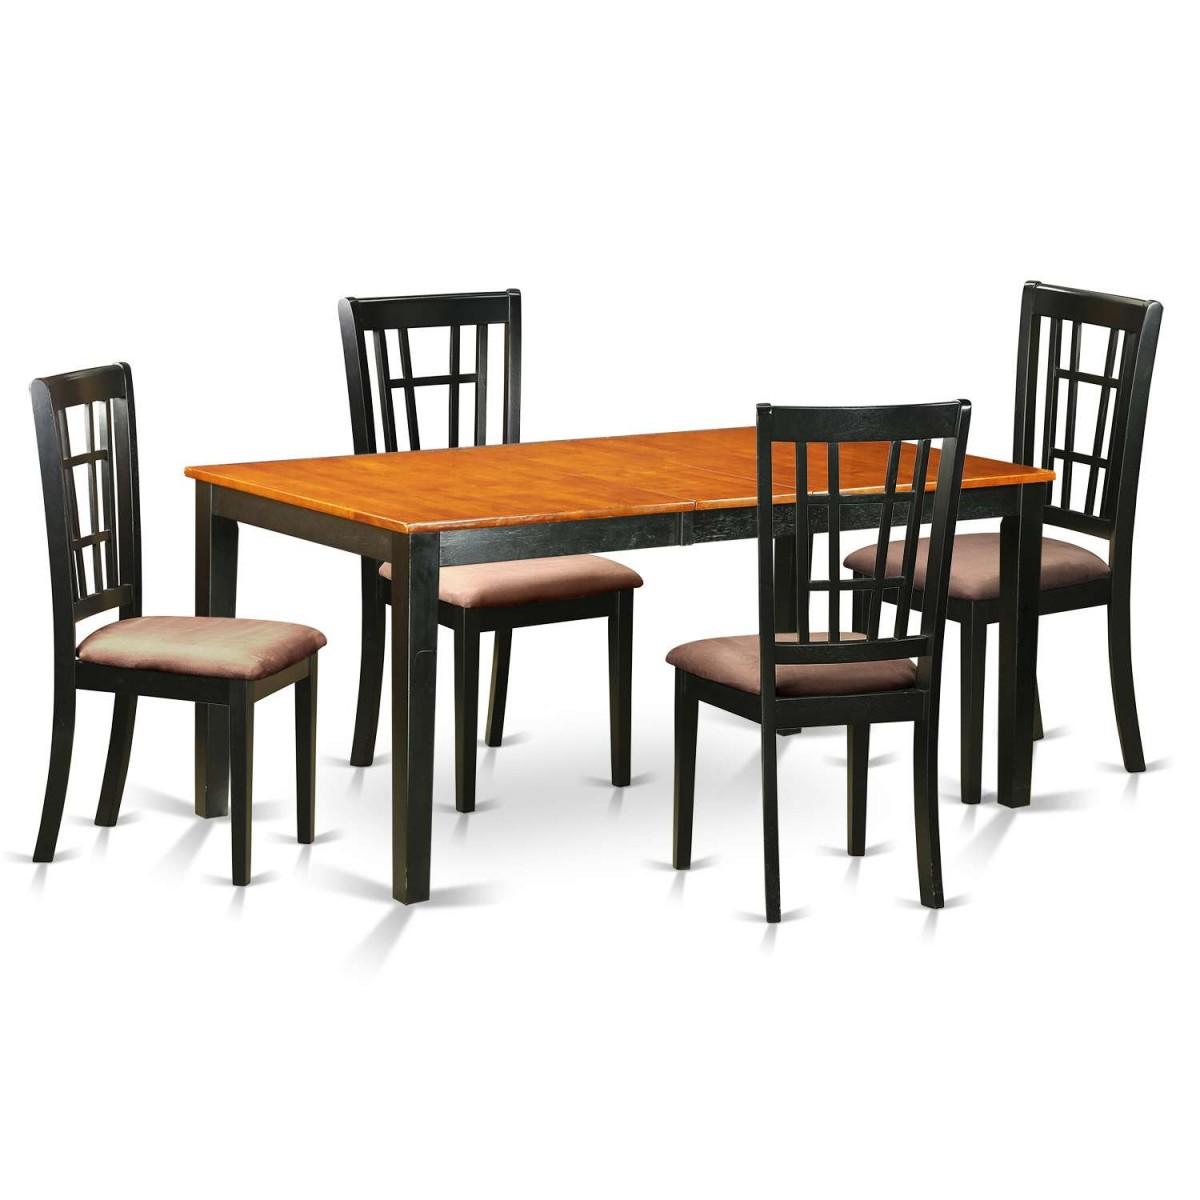 East West Nicoli 6 Piece Dining Set: East West Furniture Nicoli 5 Piece Dining Room Set